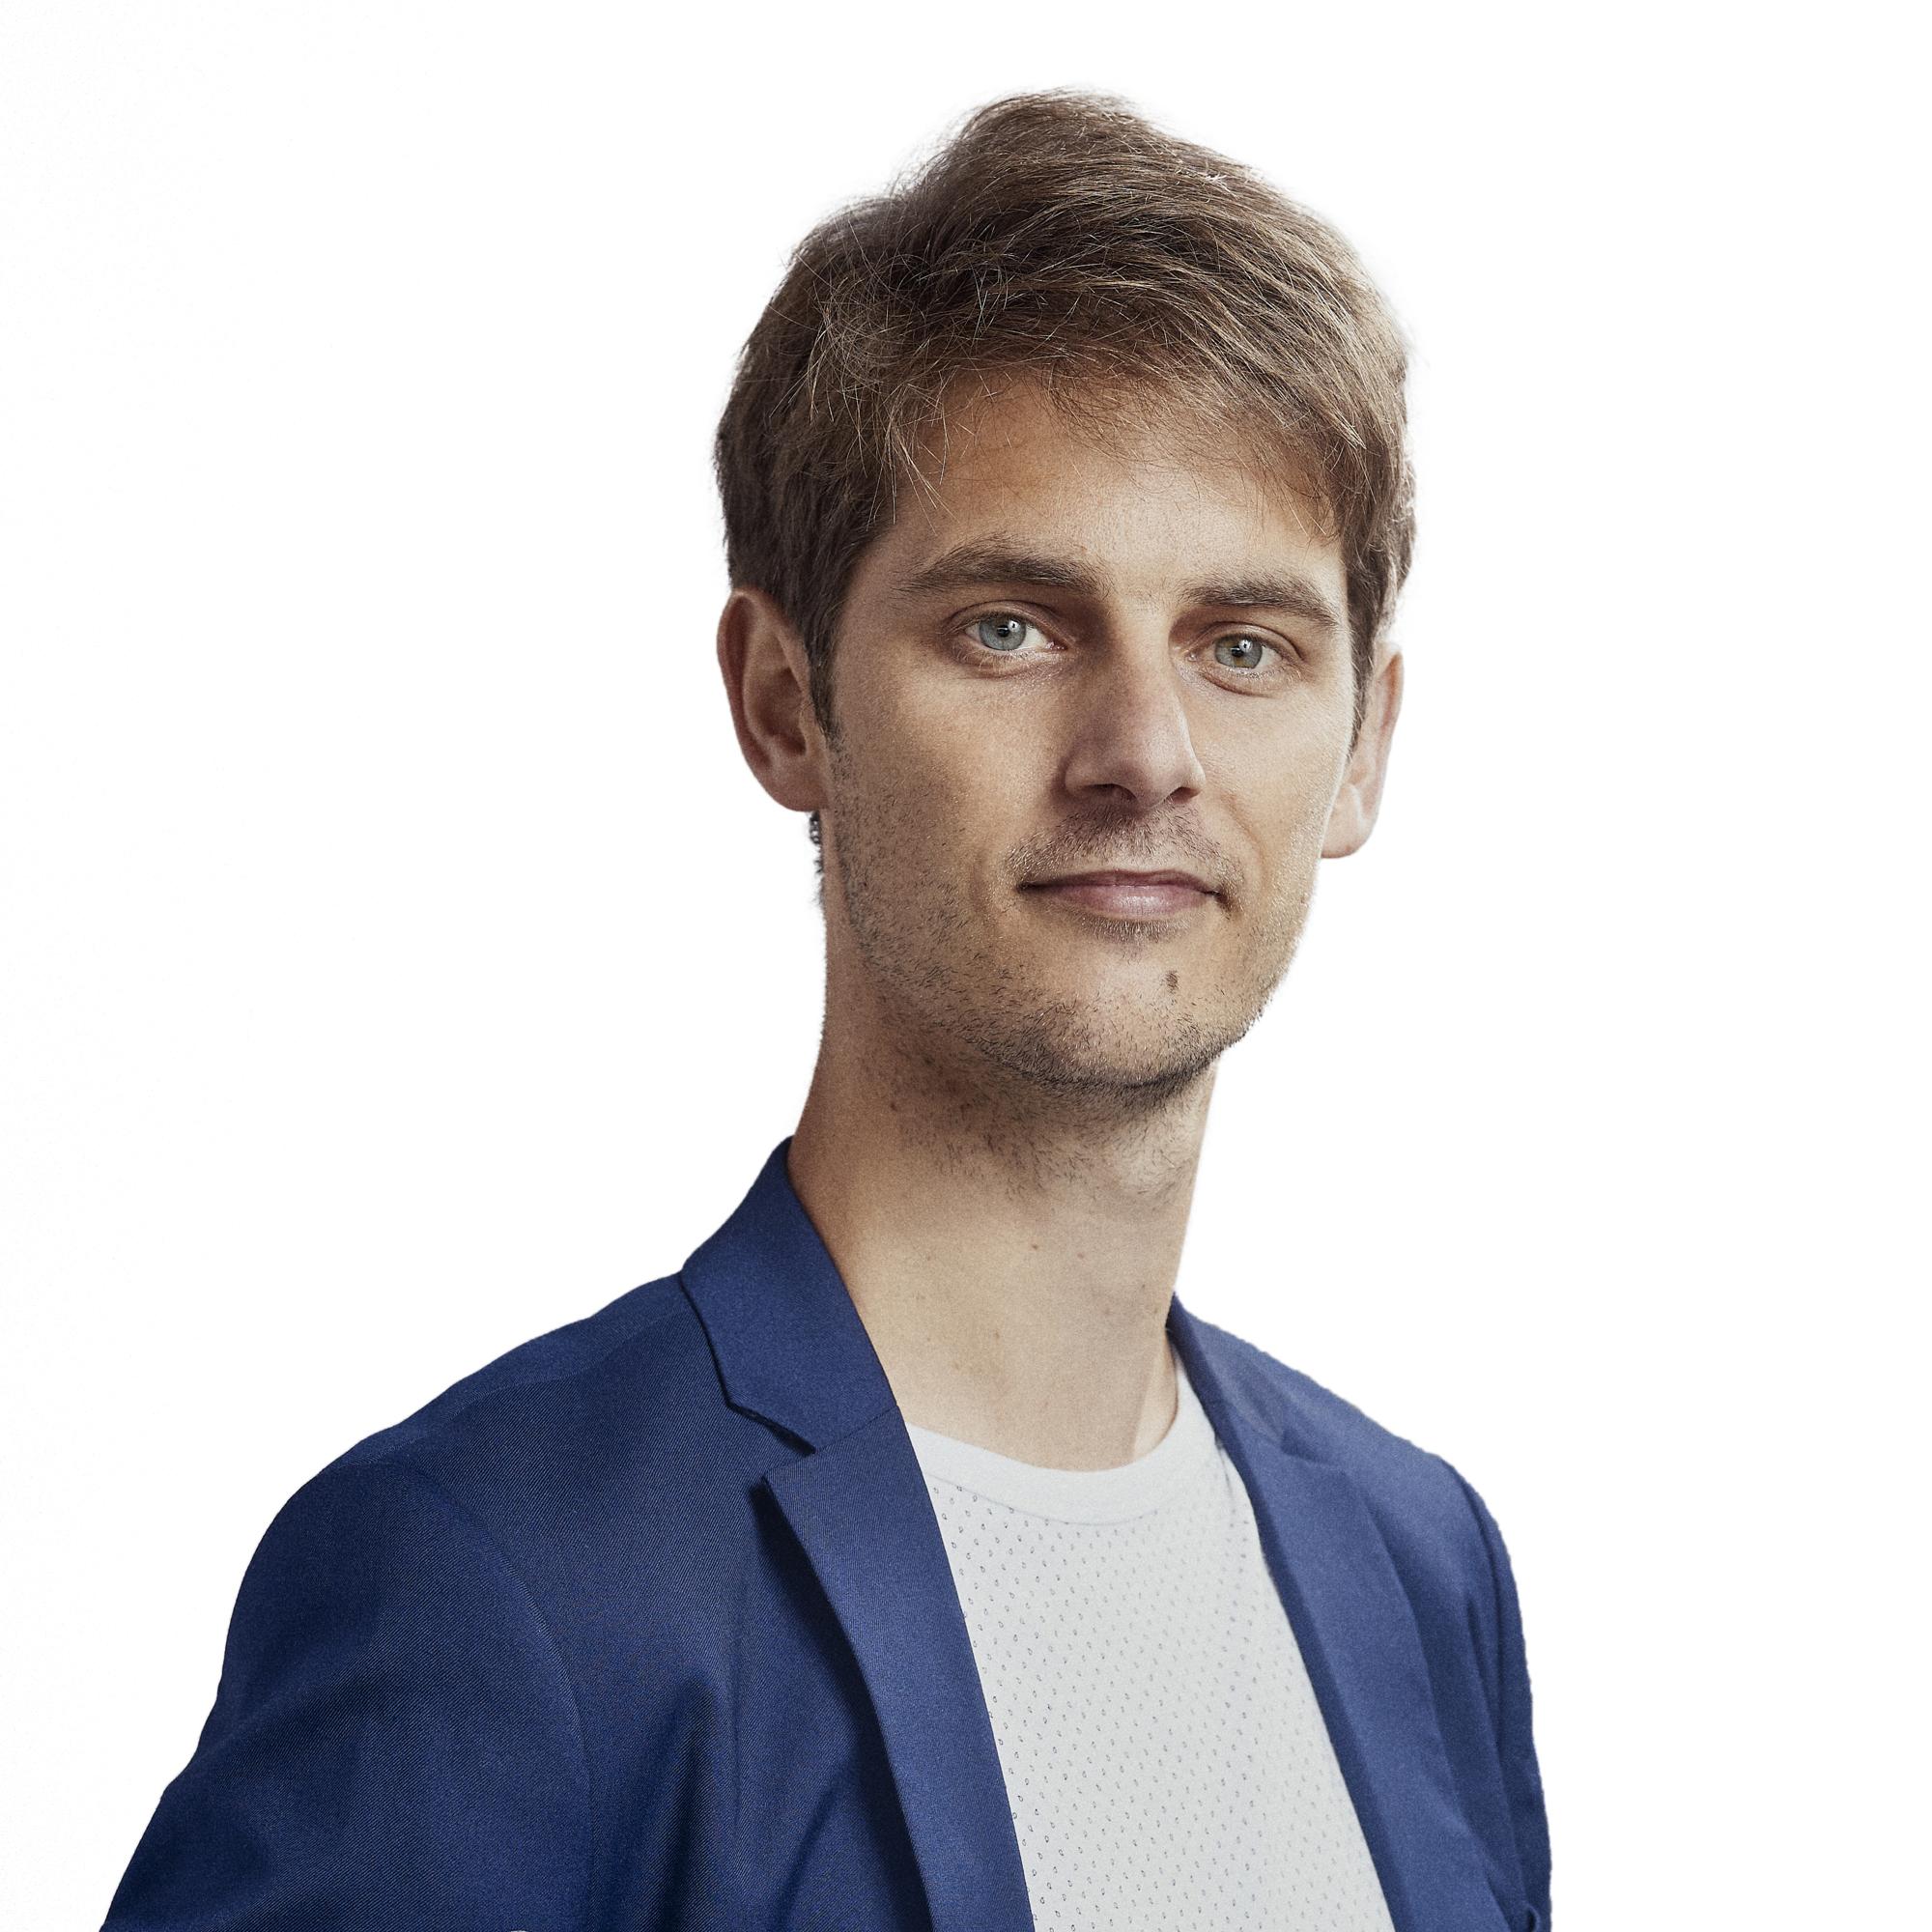 Christoph Neus